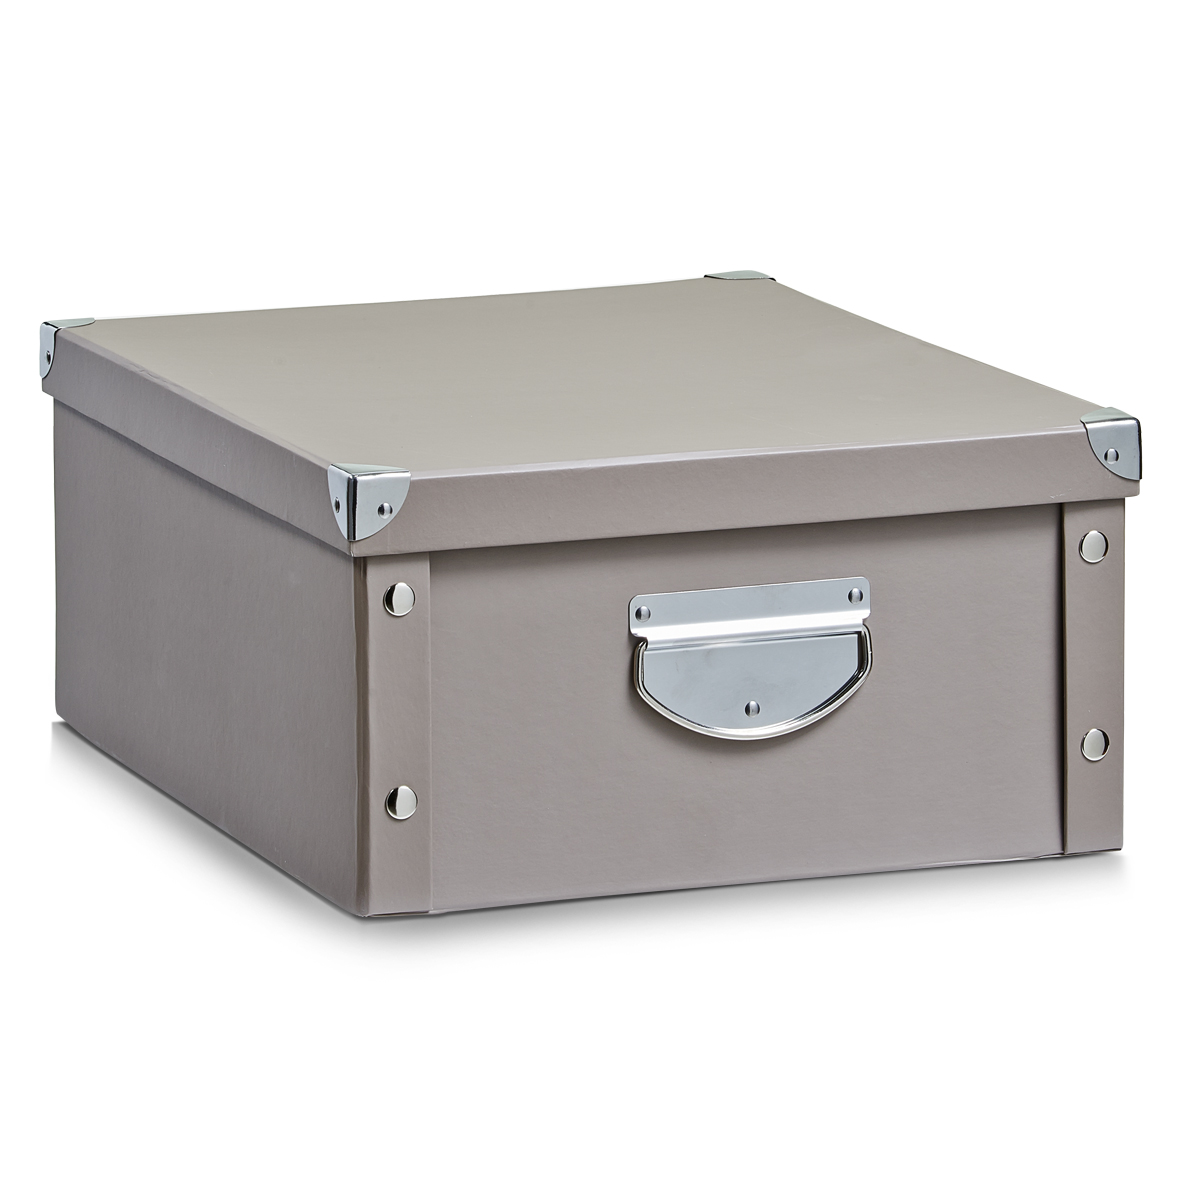 aufbewahrungsbox 40x17x3 cm pappe pappkarton pappschachtel kiste pappkiste box ebay. Black Bedroom Furniture Sets. Home Design Ideas